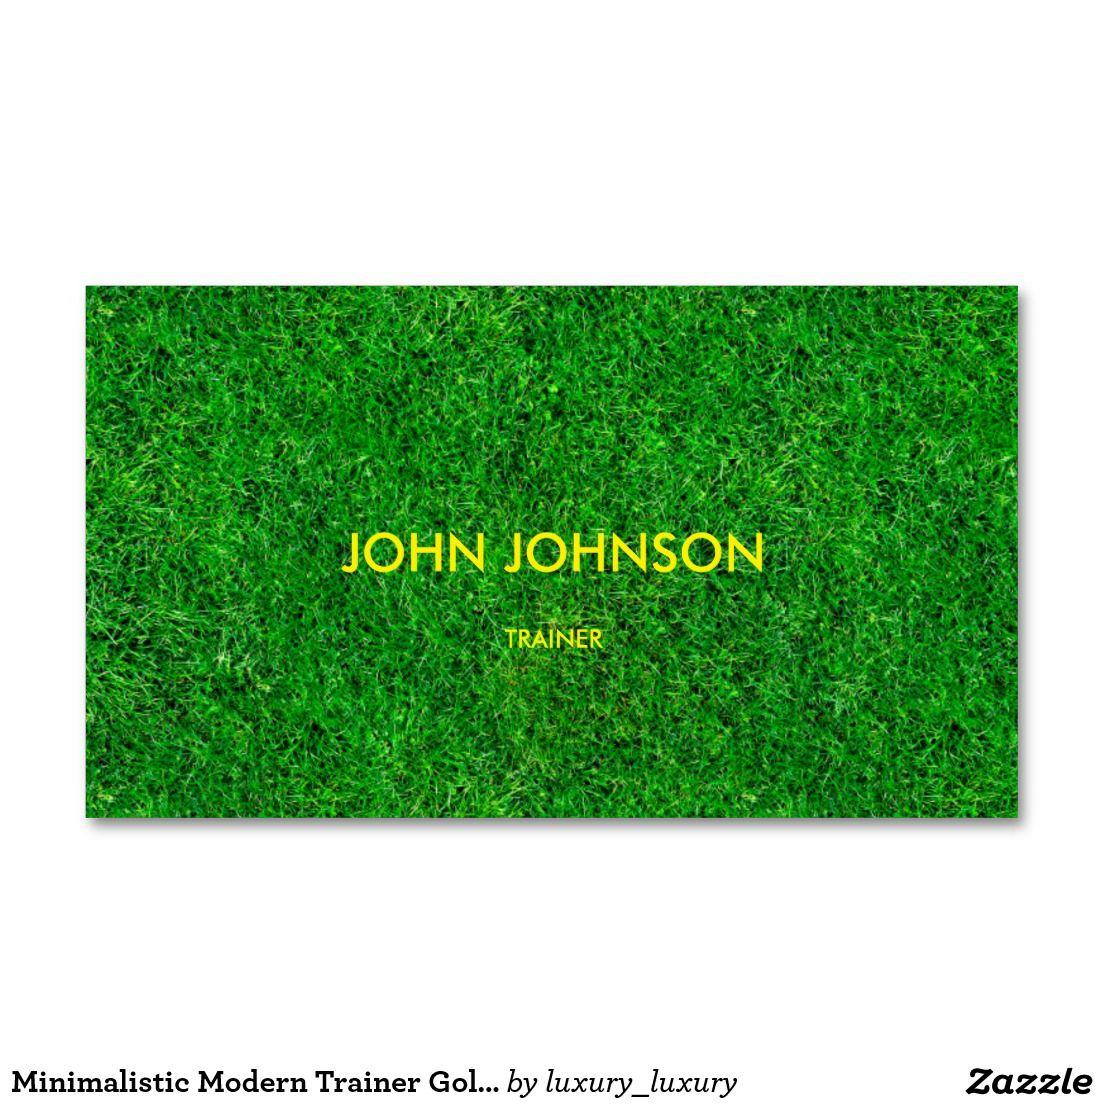 Minimalistic modern trainer golf business card vip card minimalistic modern trainer golf business card colourmoves